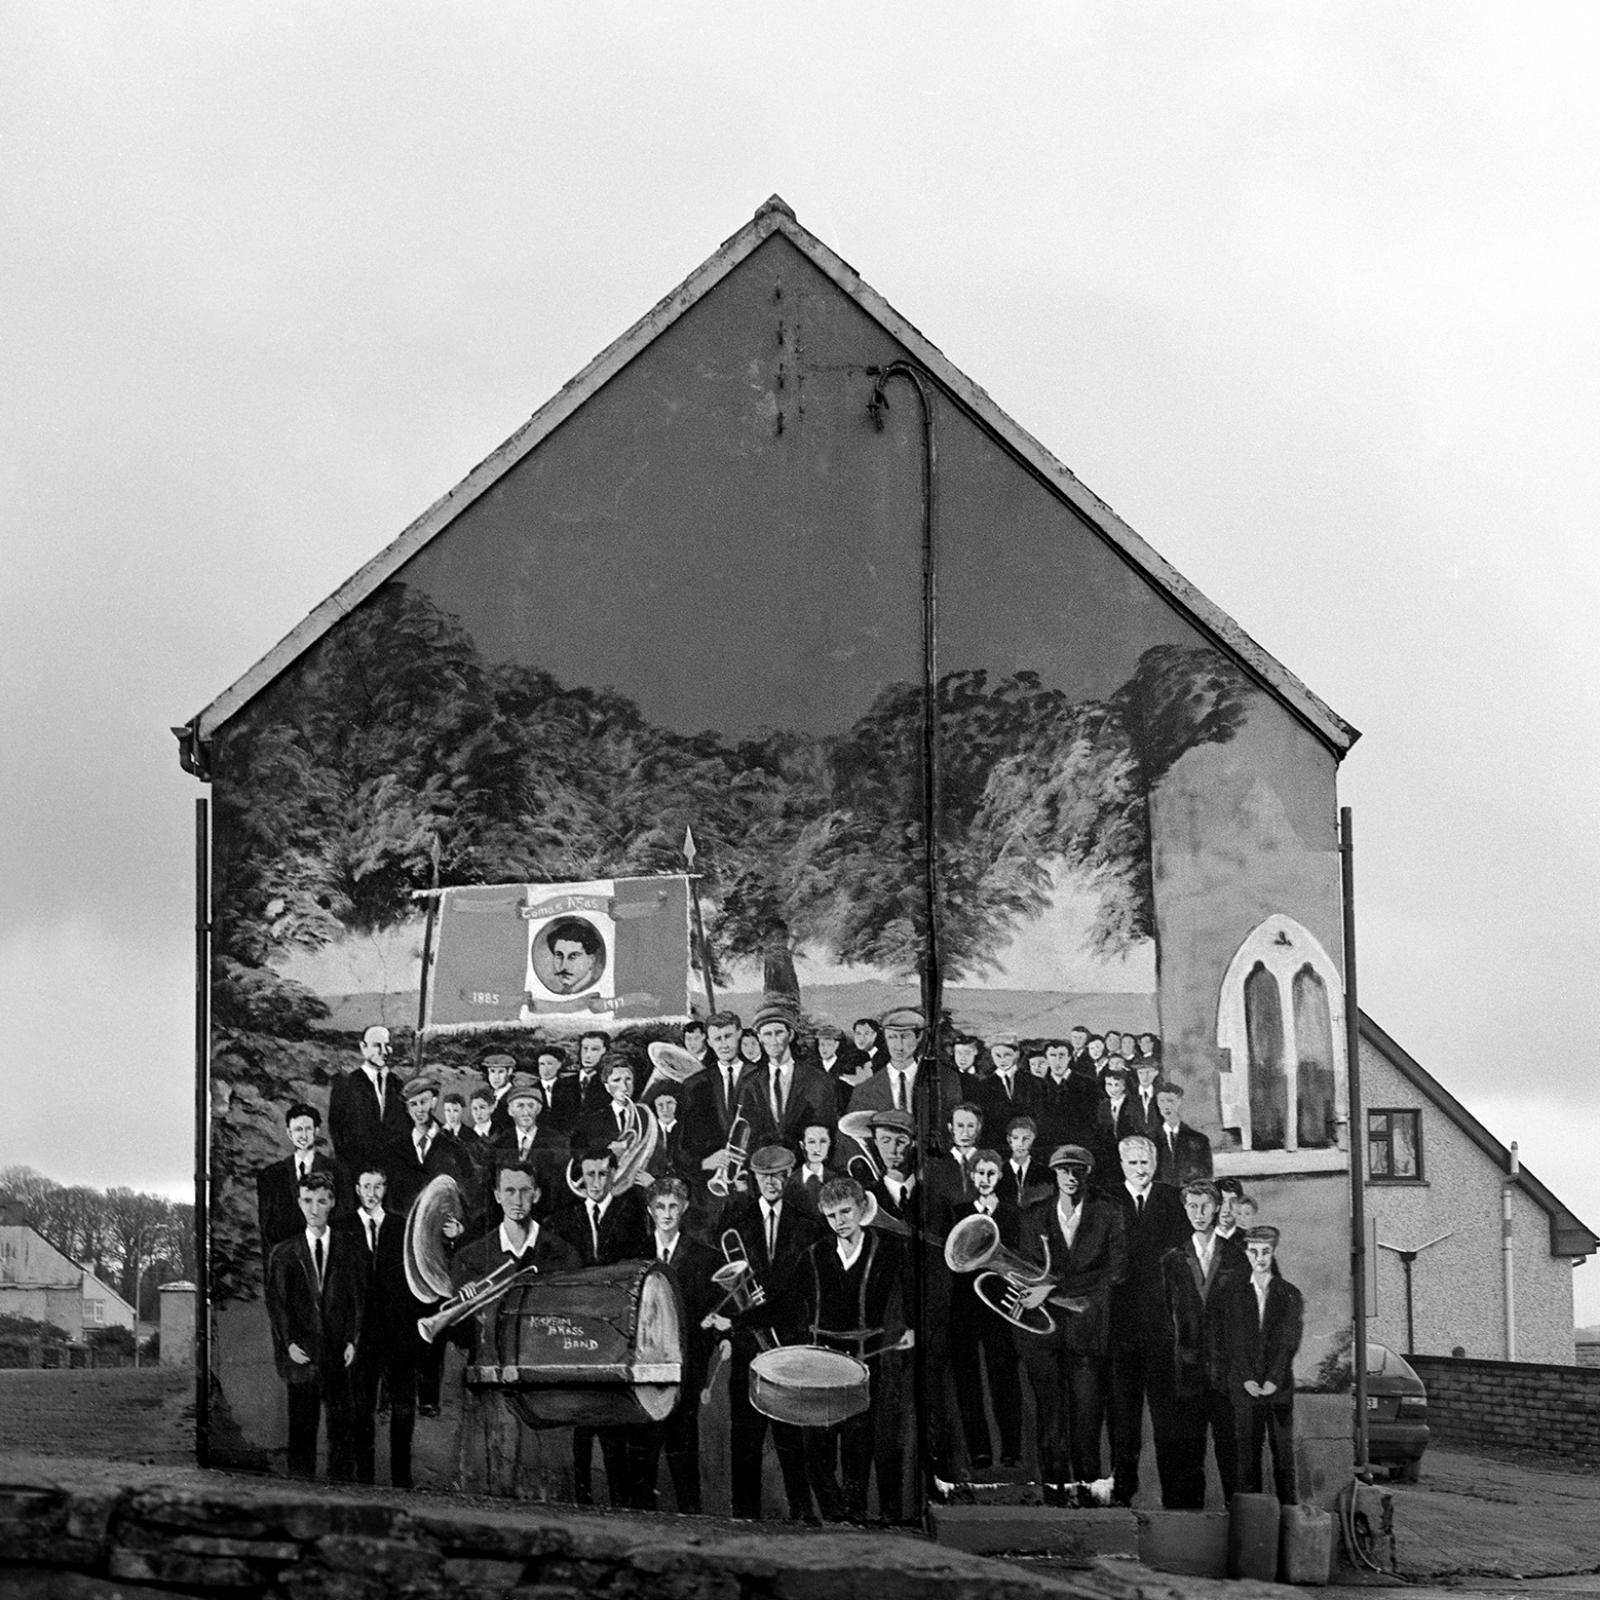 Co. Cork, Ireland—2008